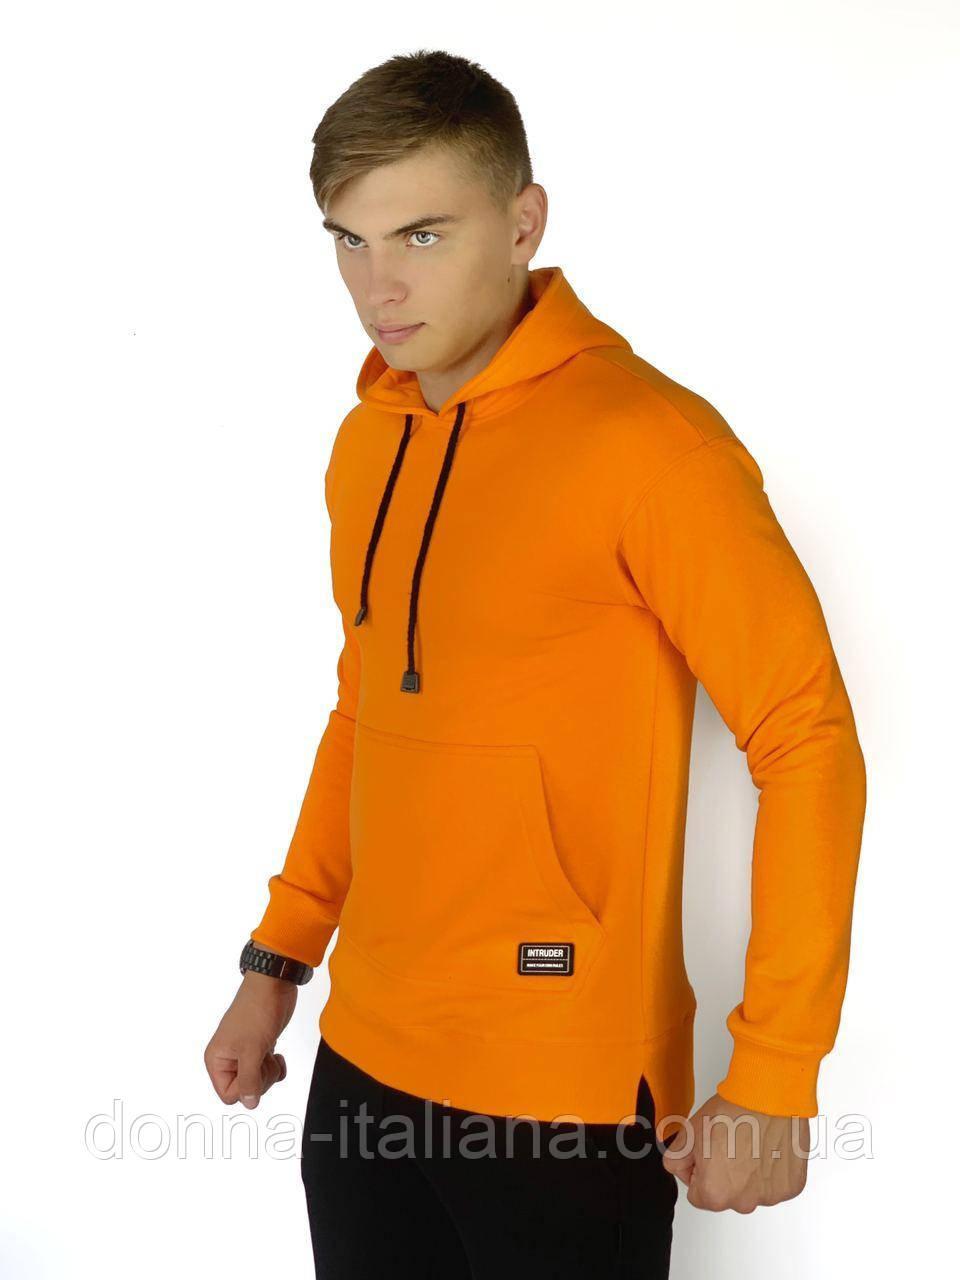 Худи Intruder 'Spark' L Оранжевый (1598714459/2)